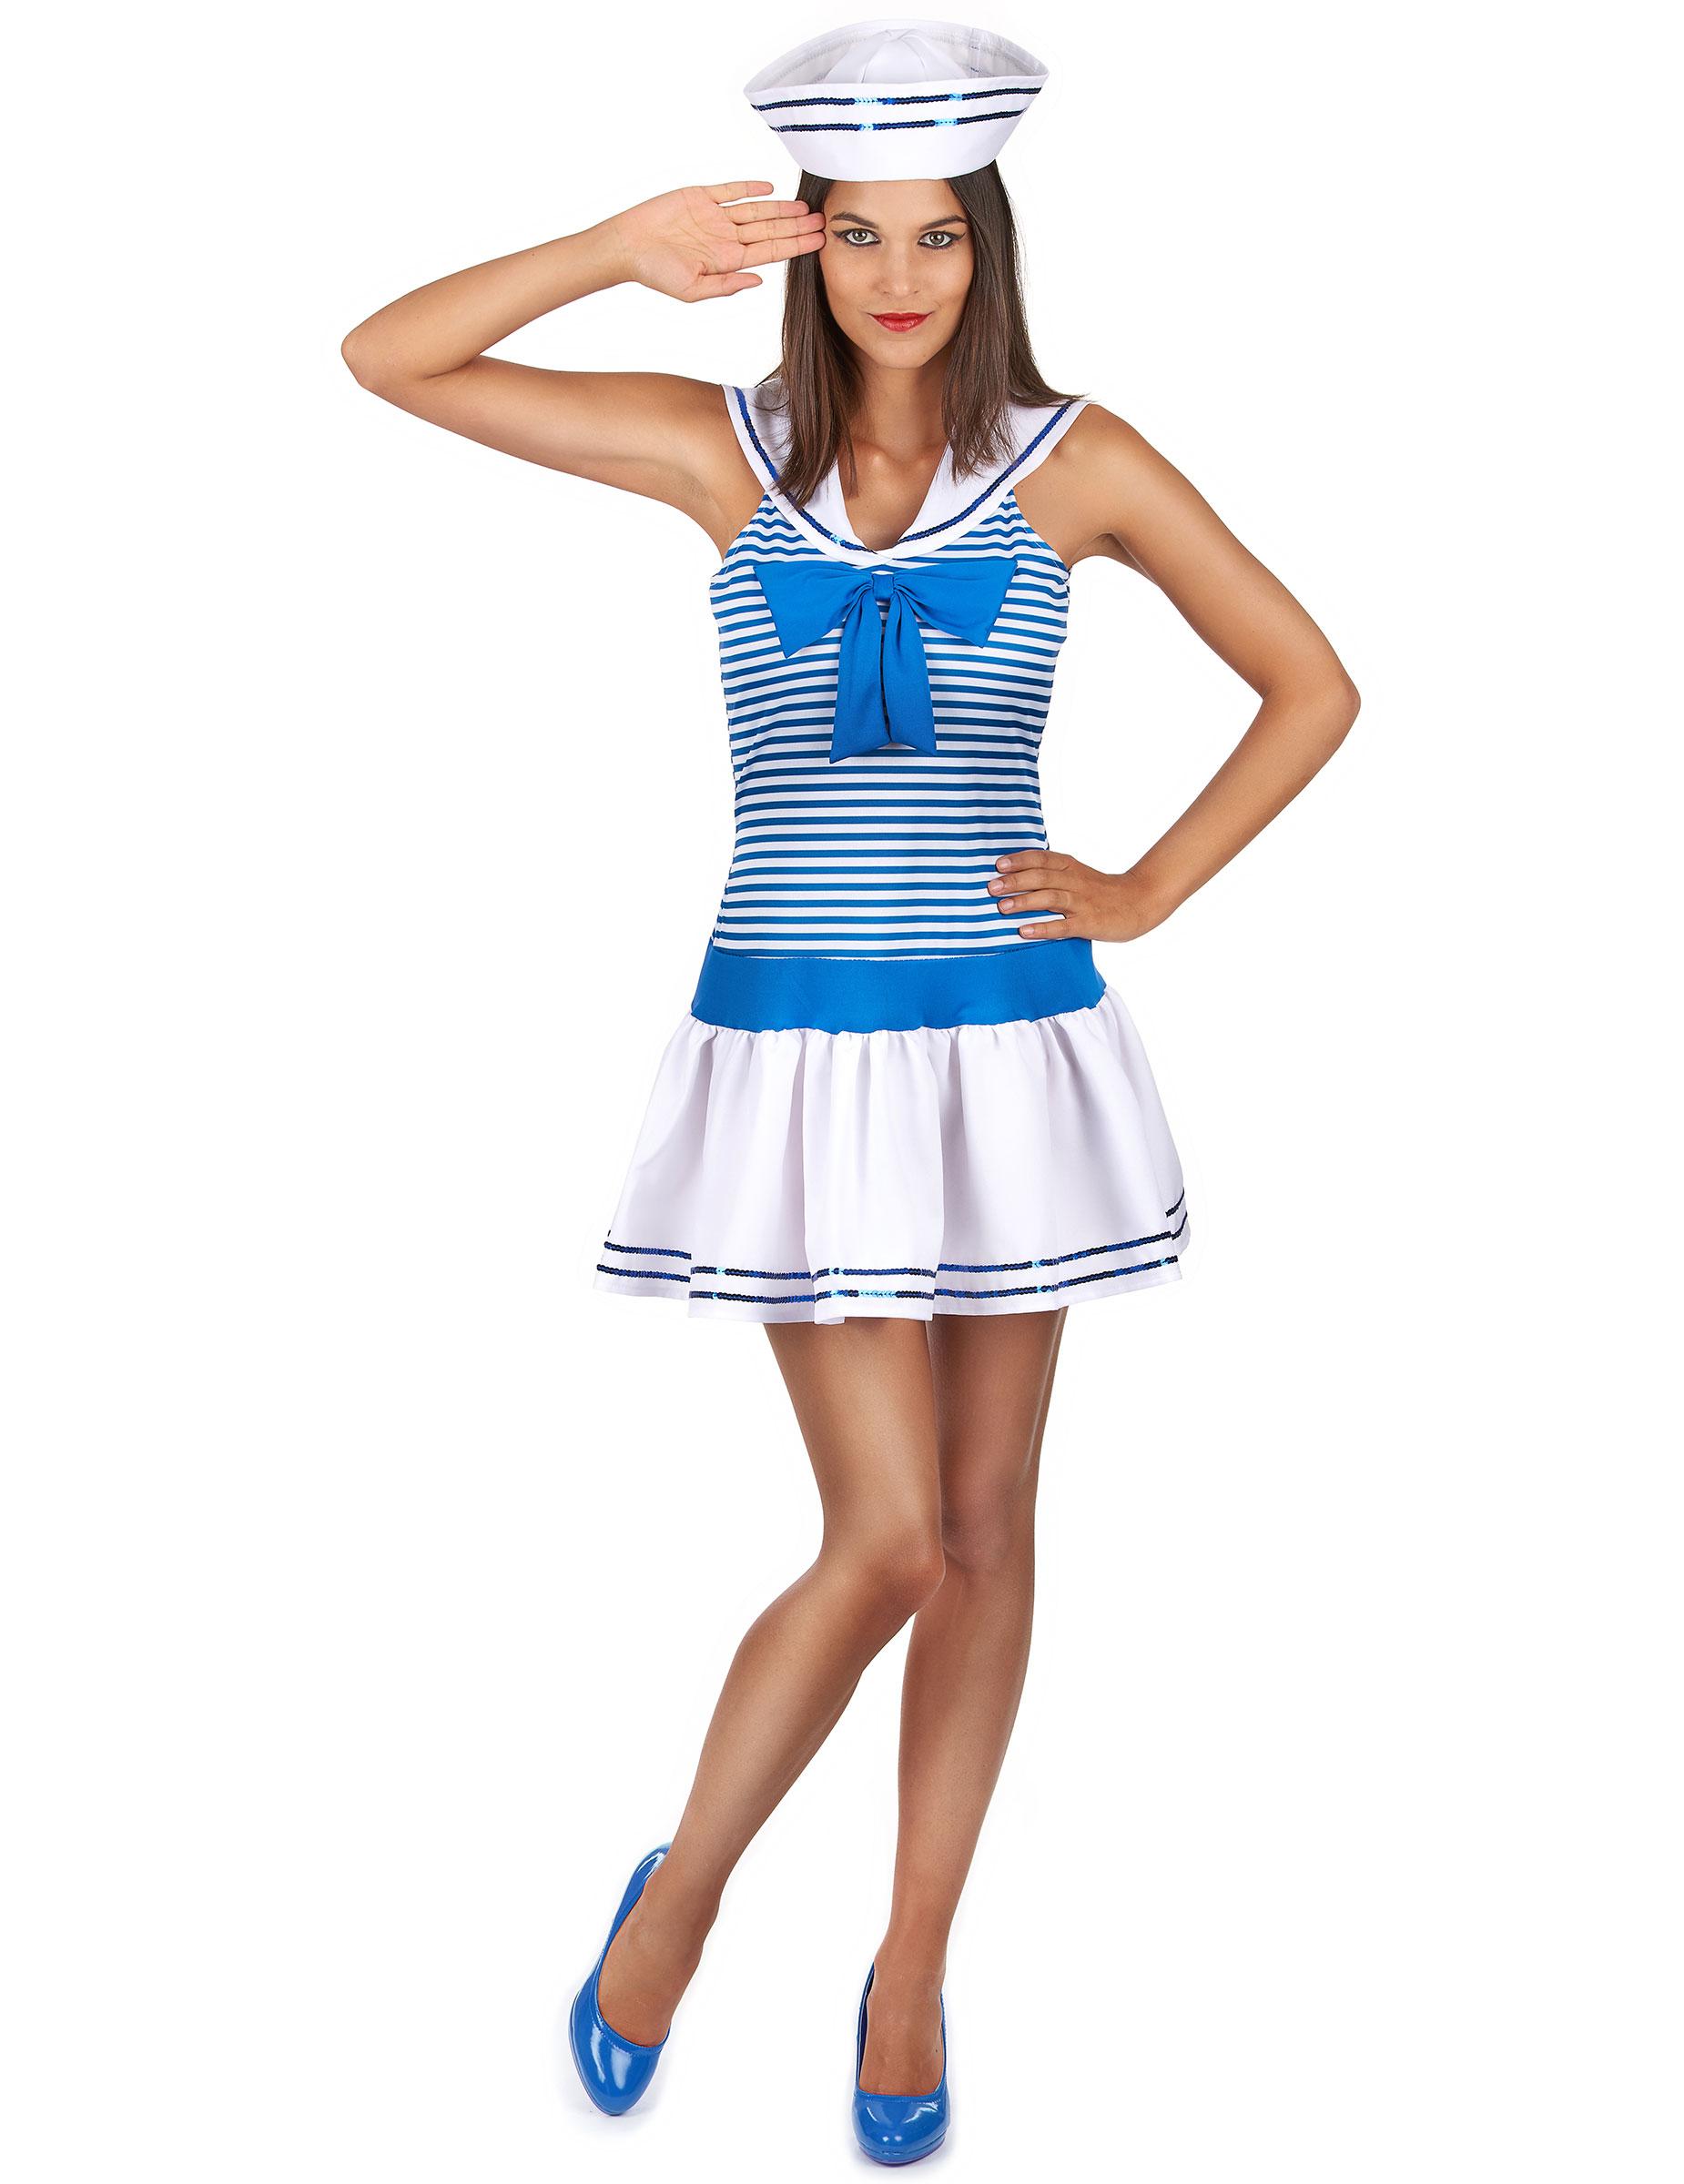 Damen Kostüm Matrosin Kleid blau weiß Karneval Fasching Smi